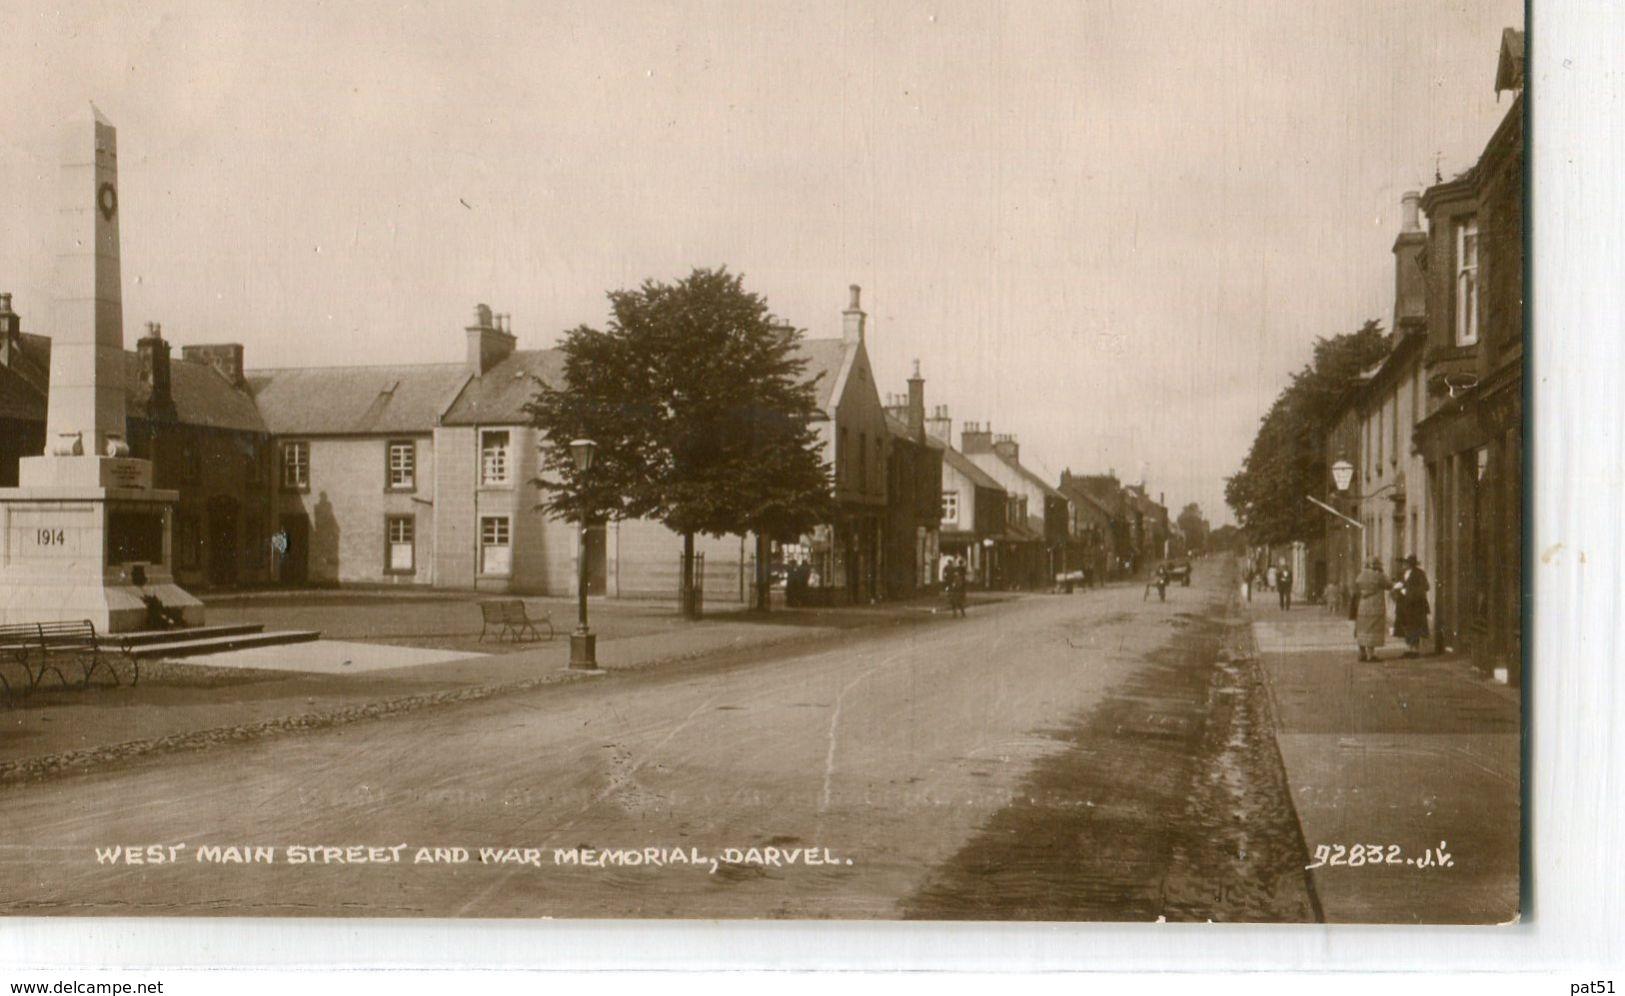 UNITED KINGDOM / ROYAUME - UNI - Darvel : West Main Street And War Memorial - Ayrshire